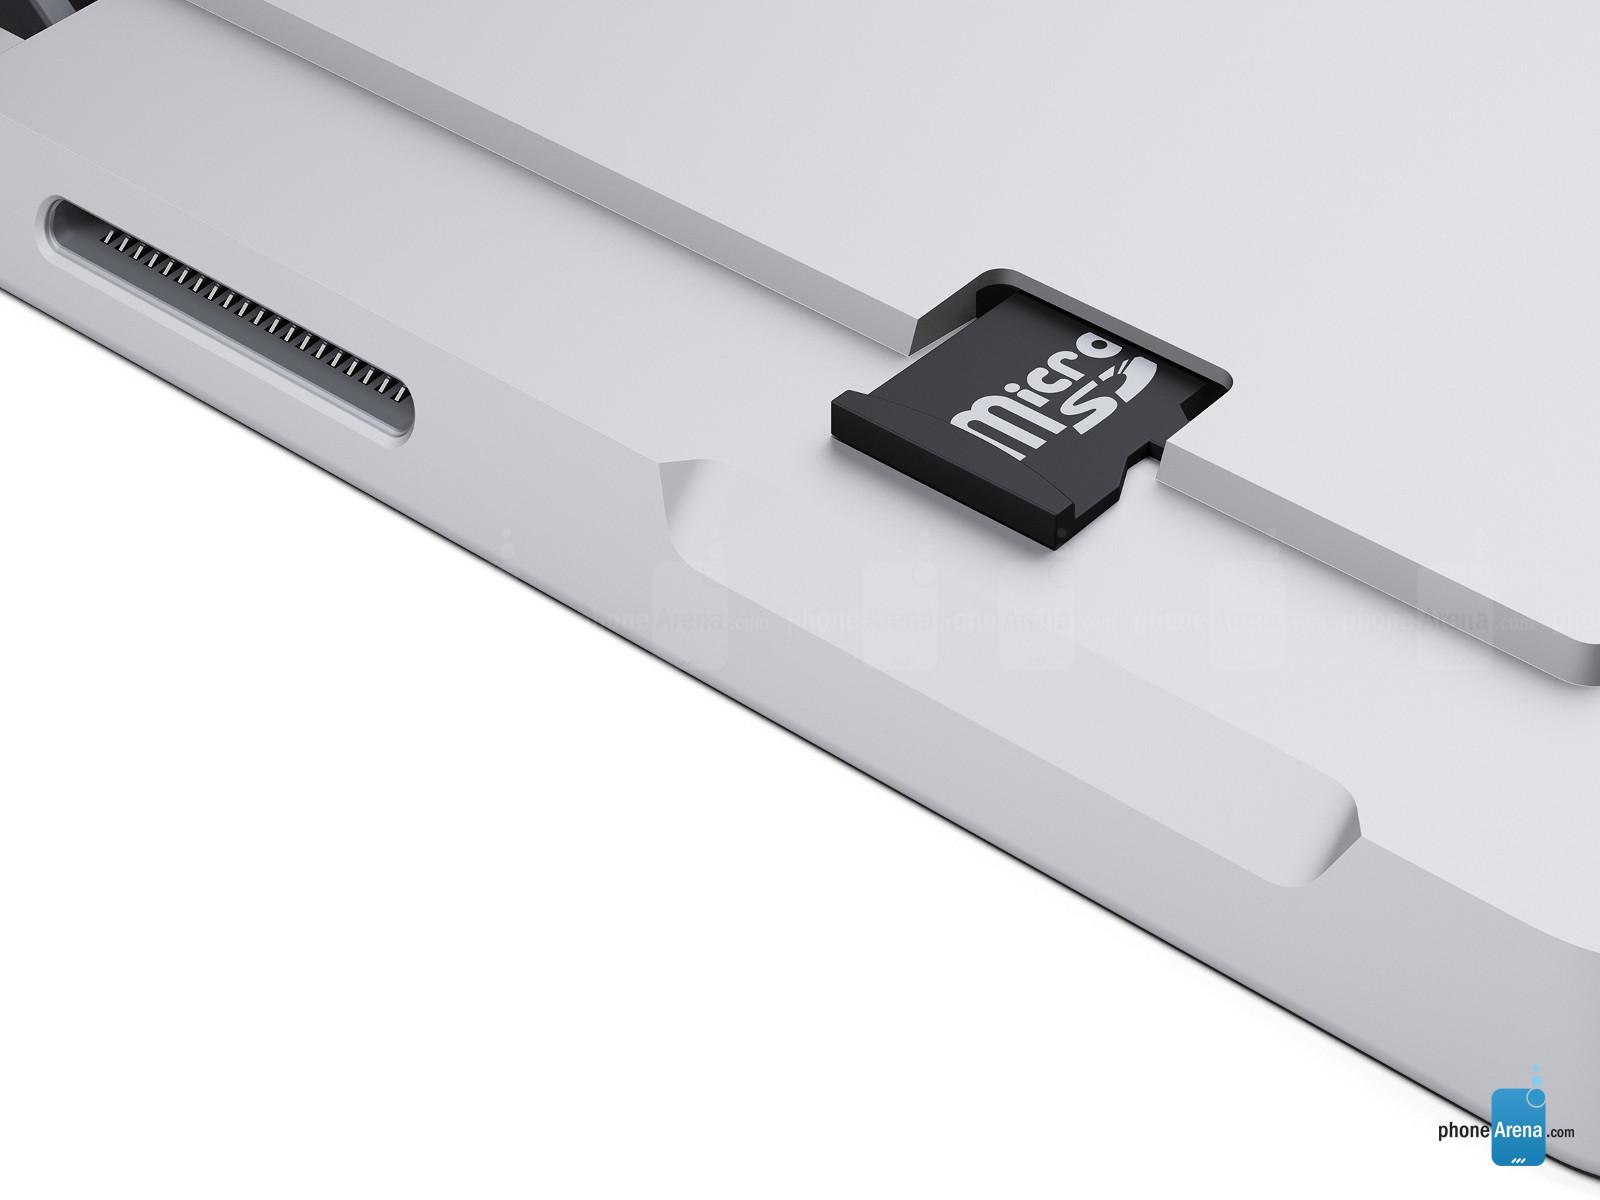 how to change camera resolution on ipad mini